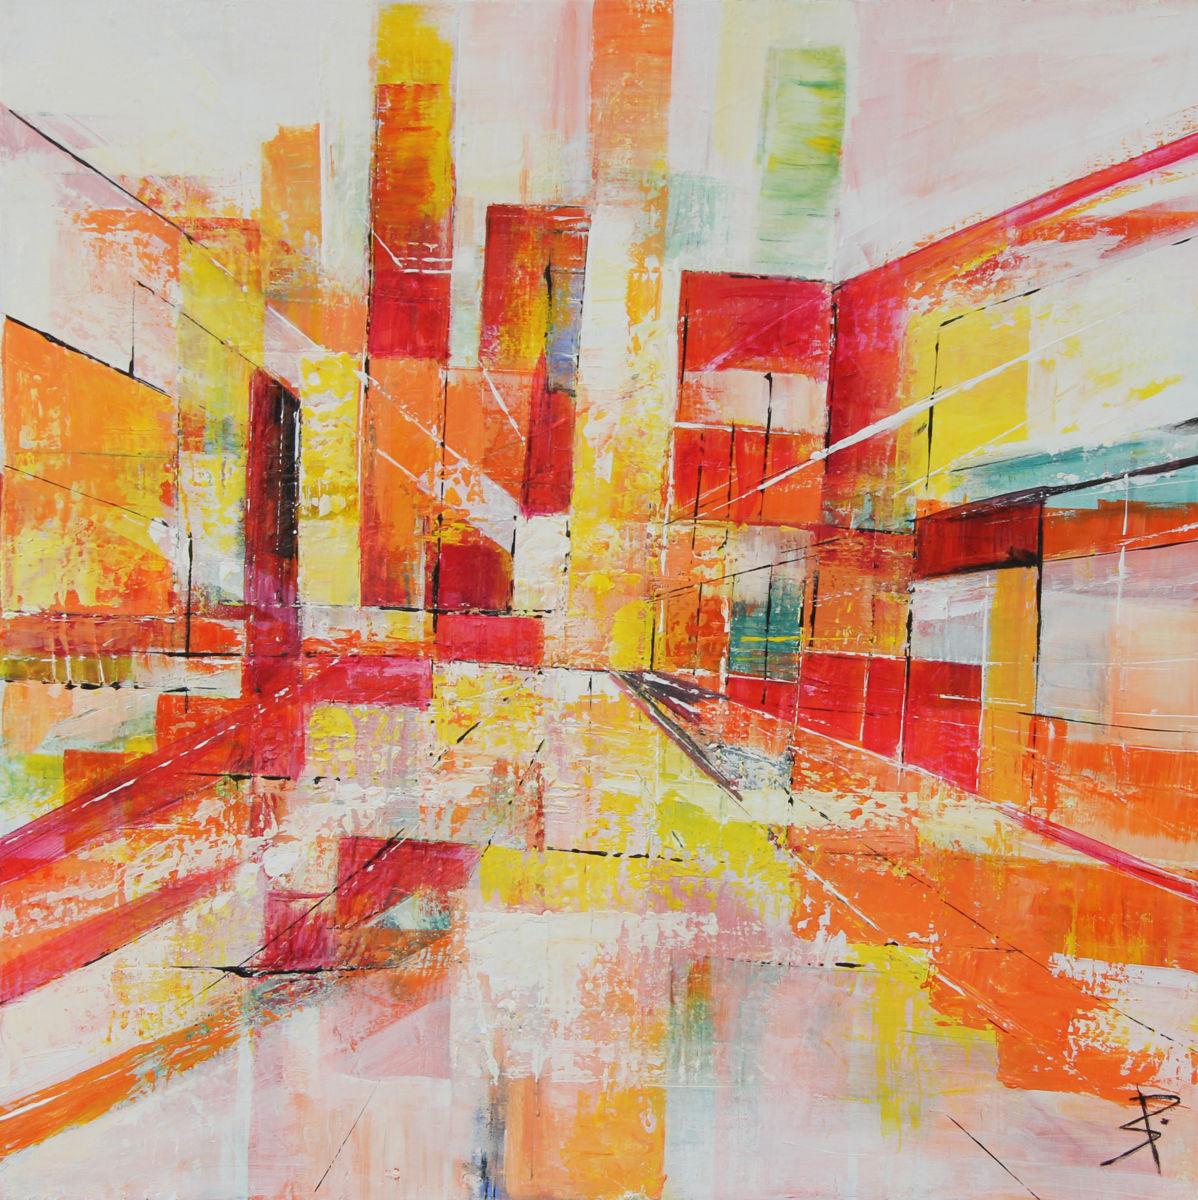 Peinture, sculpture, savoie, suisse, agora